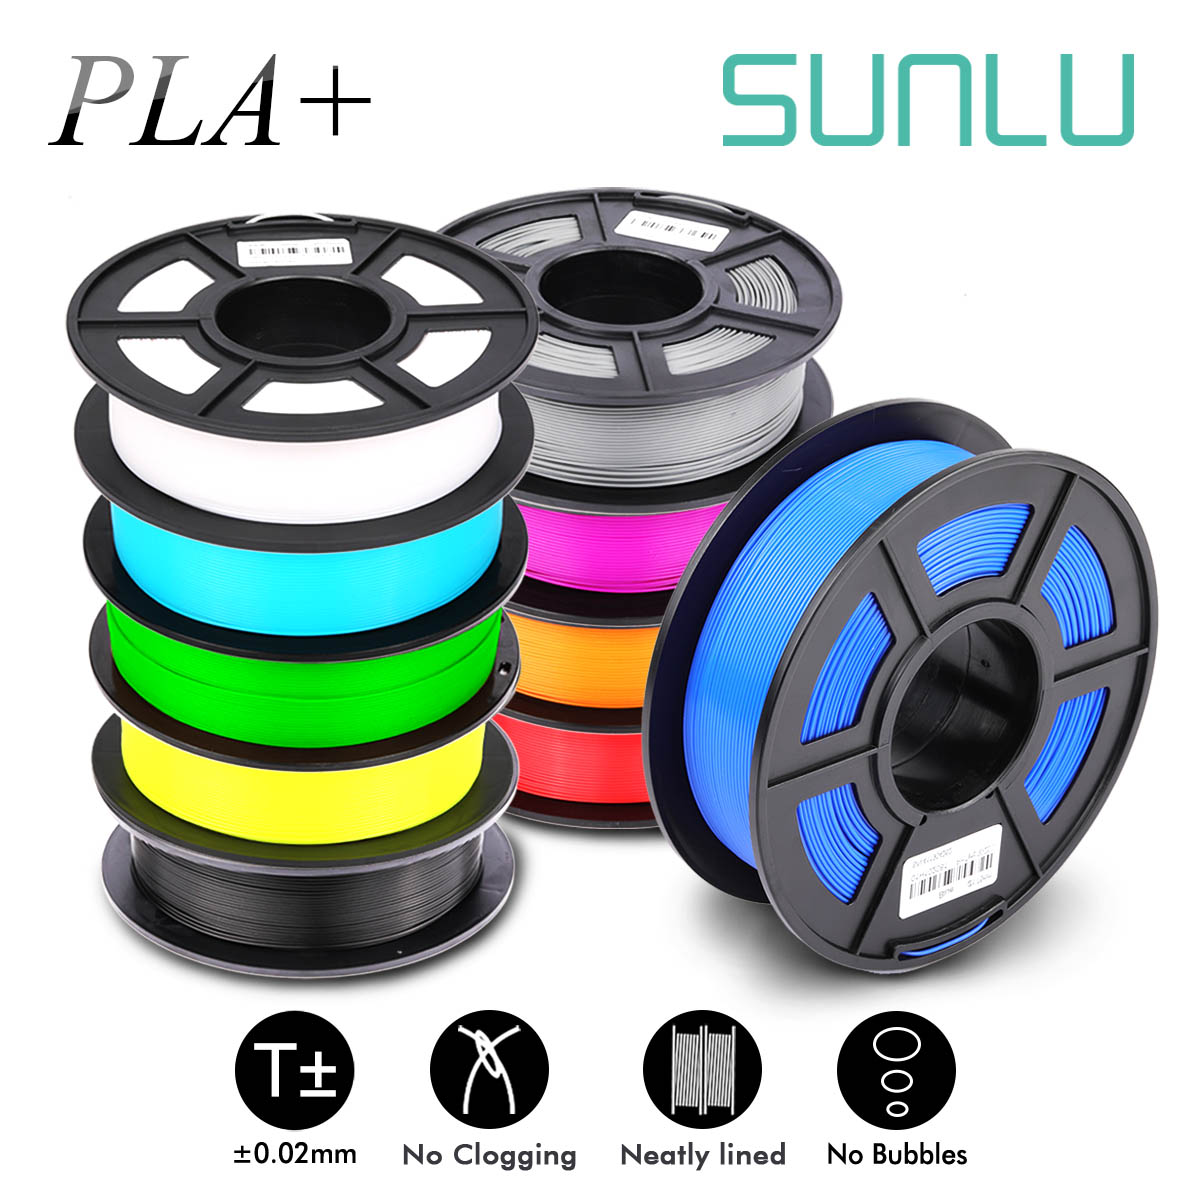 SUNLU 1.75mm PLA PLUS Filament 1KG Accuracy Dimension +/-0.02mm Multi-colors For Choose 3D Printer Filament